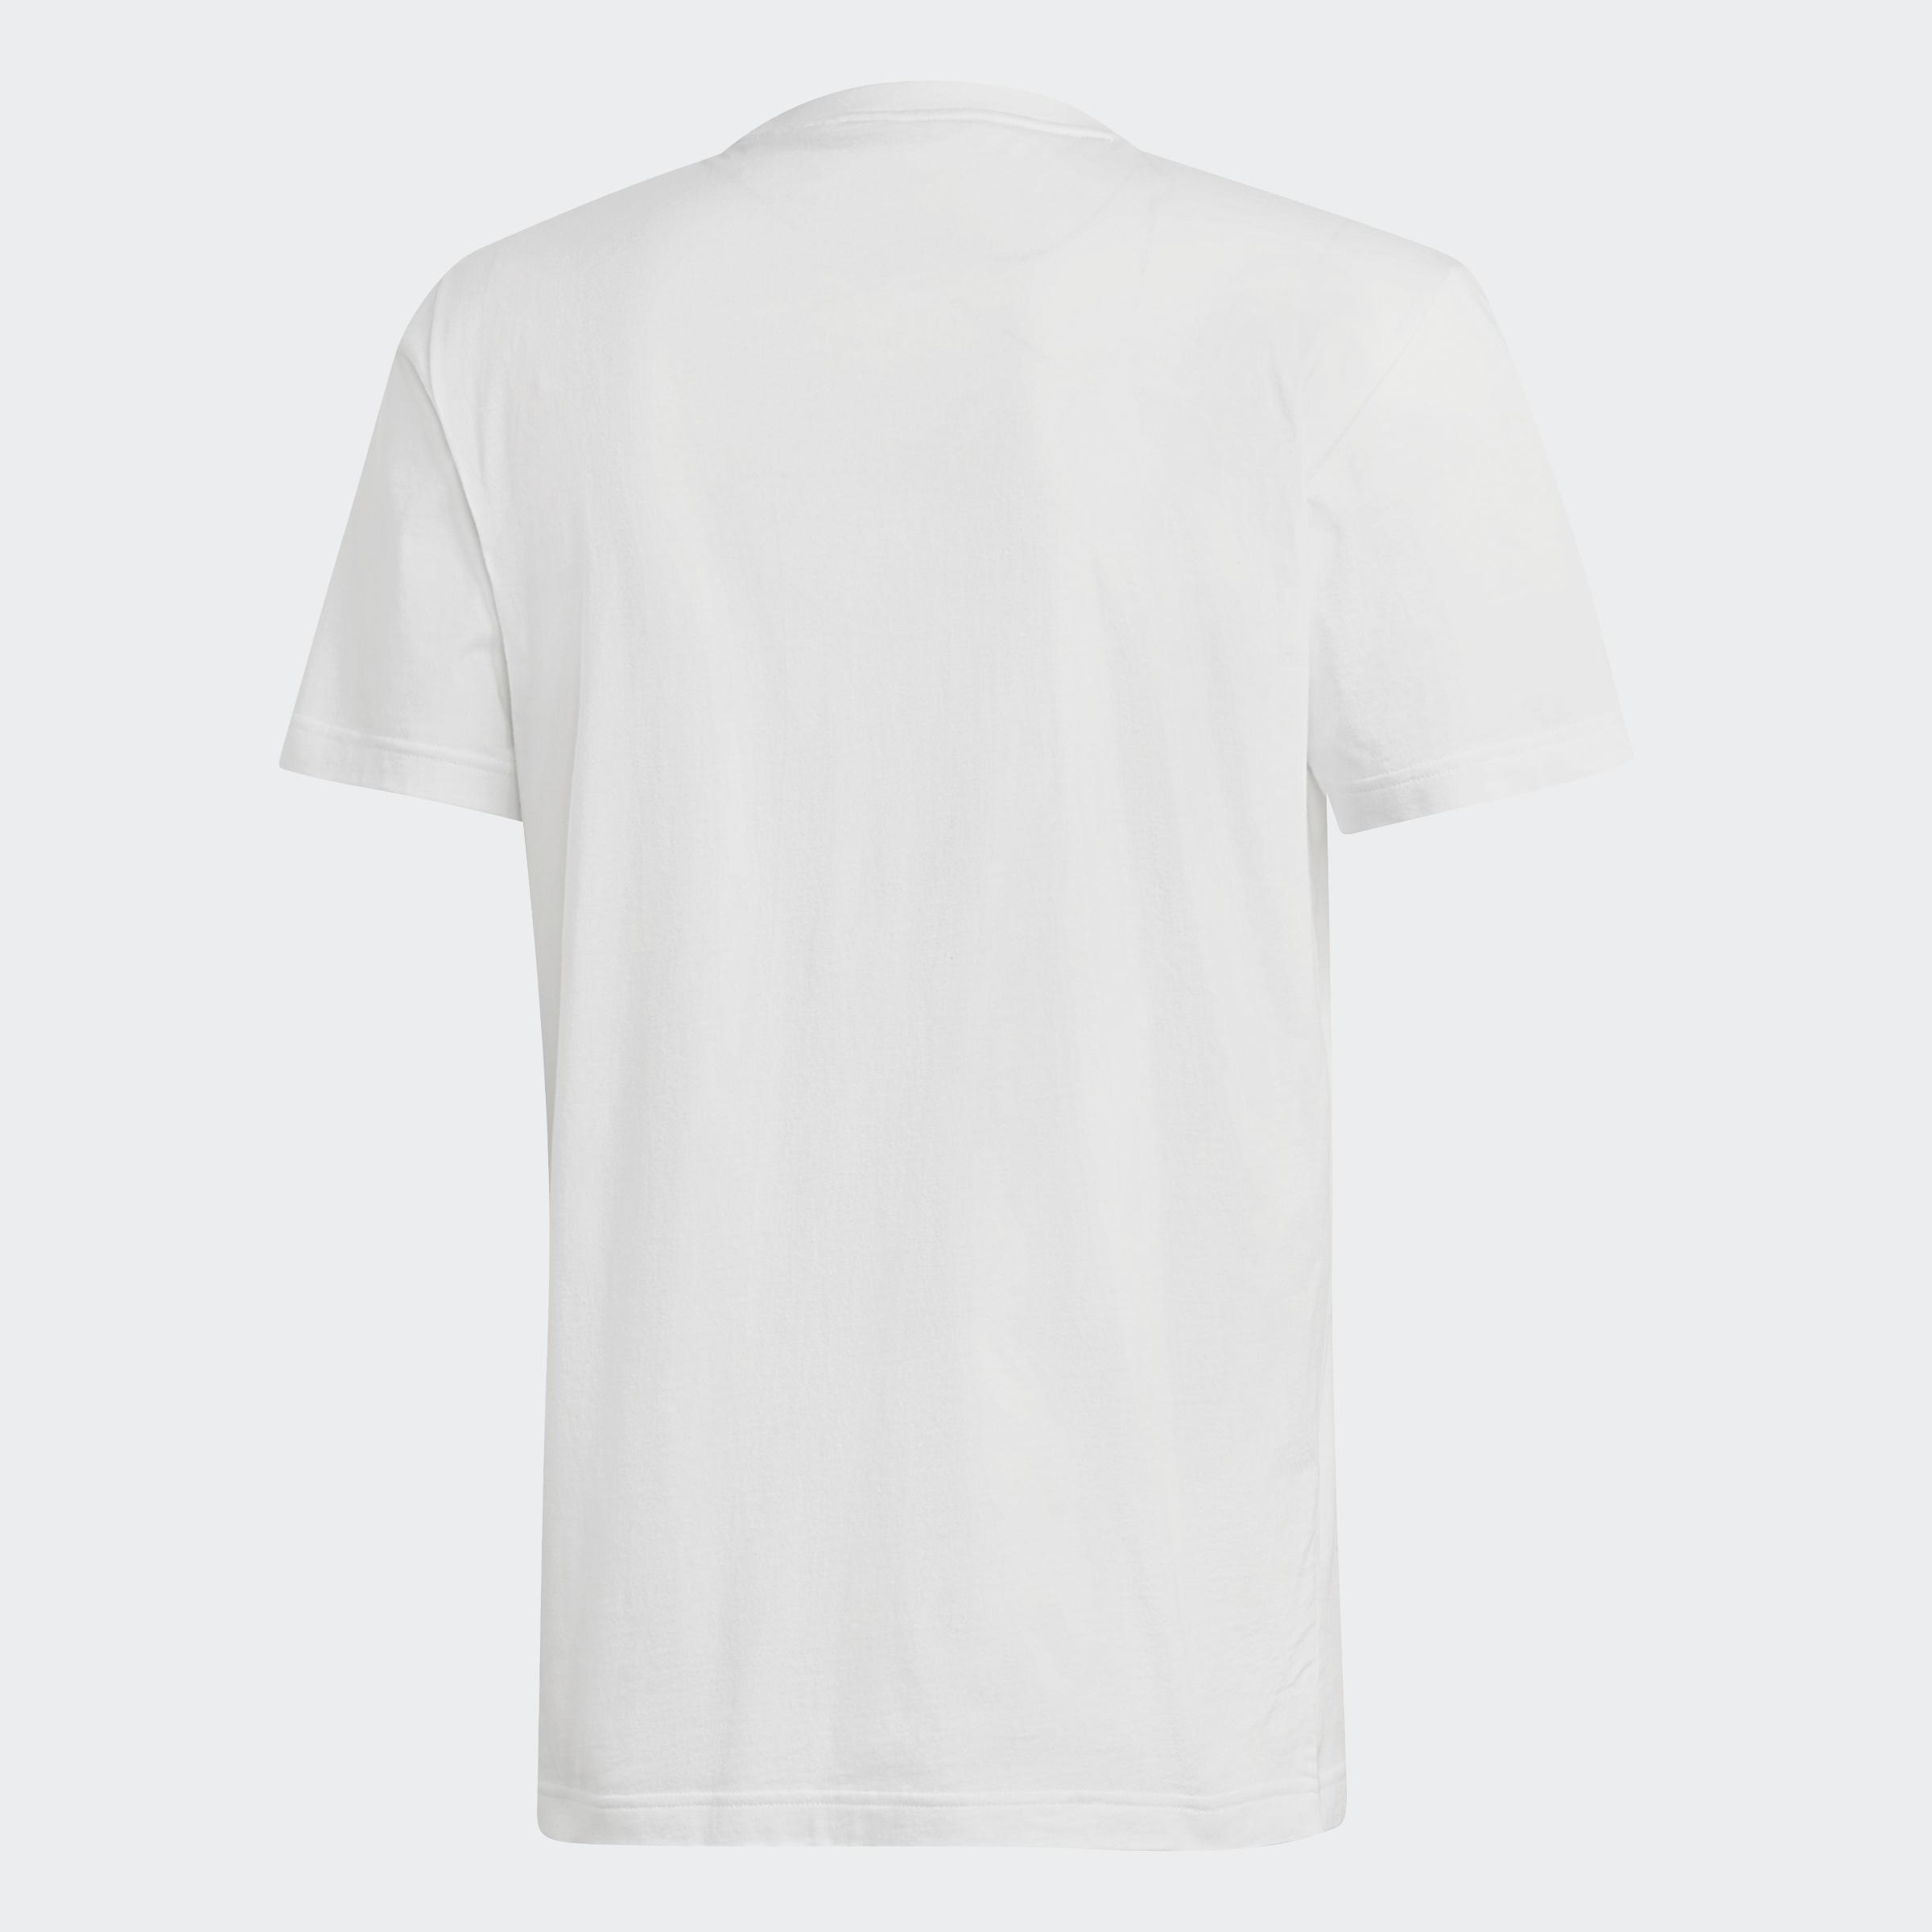 adidas-Must-Haves-Badge-of-Sport-Tee-Men-039-s-Shirts thumbnail 4